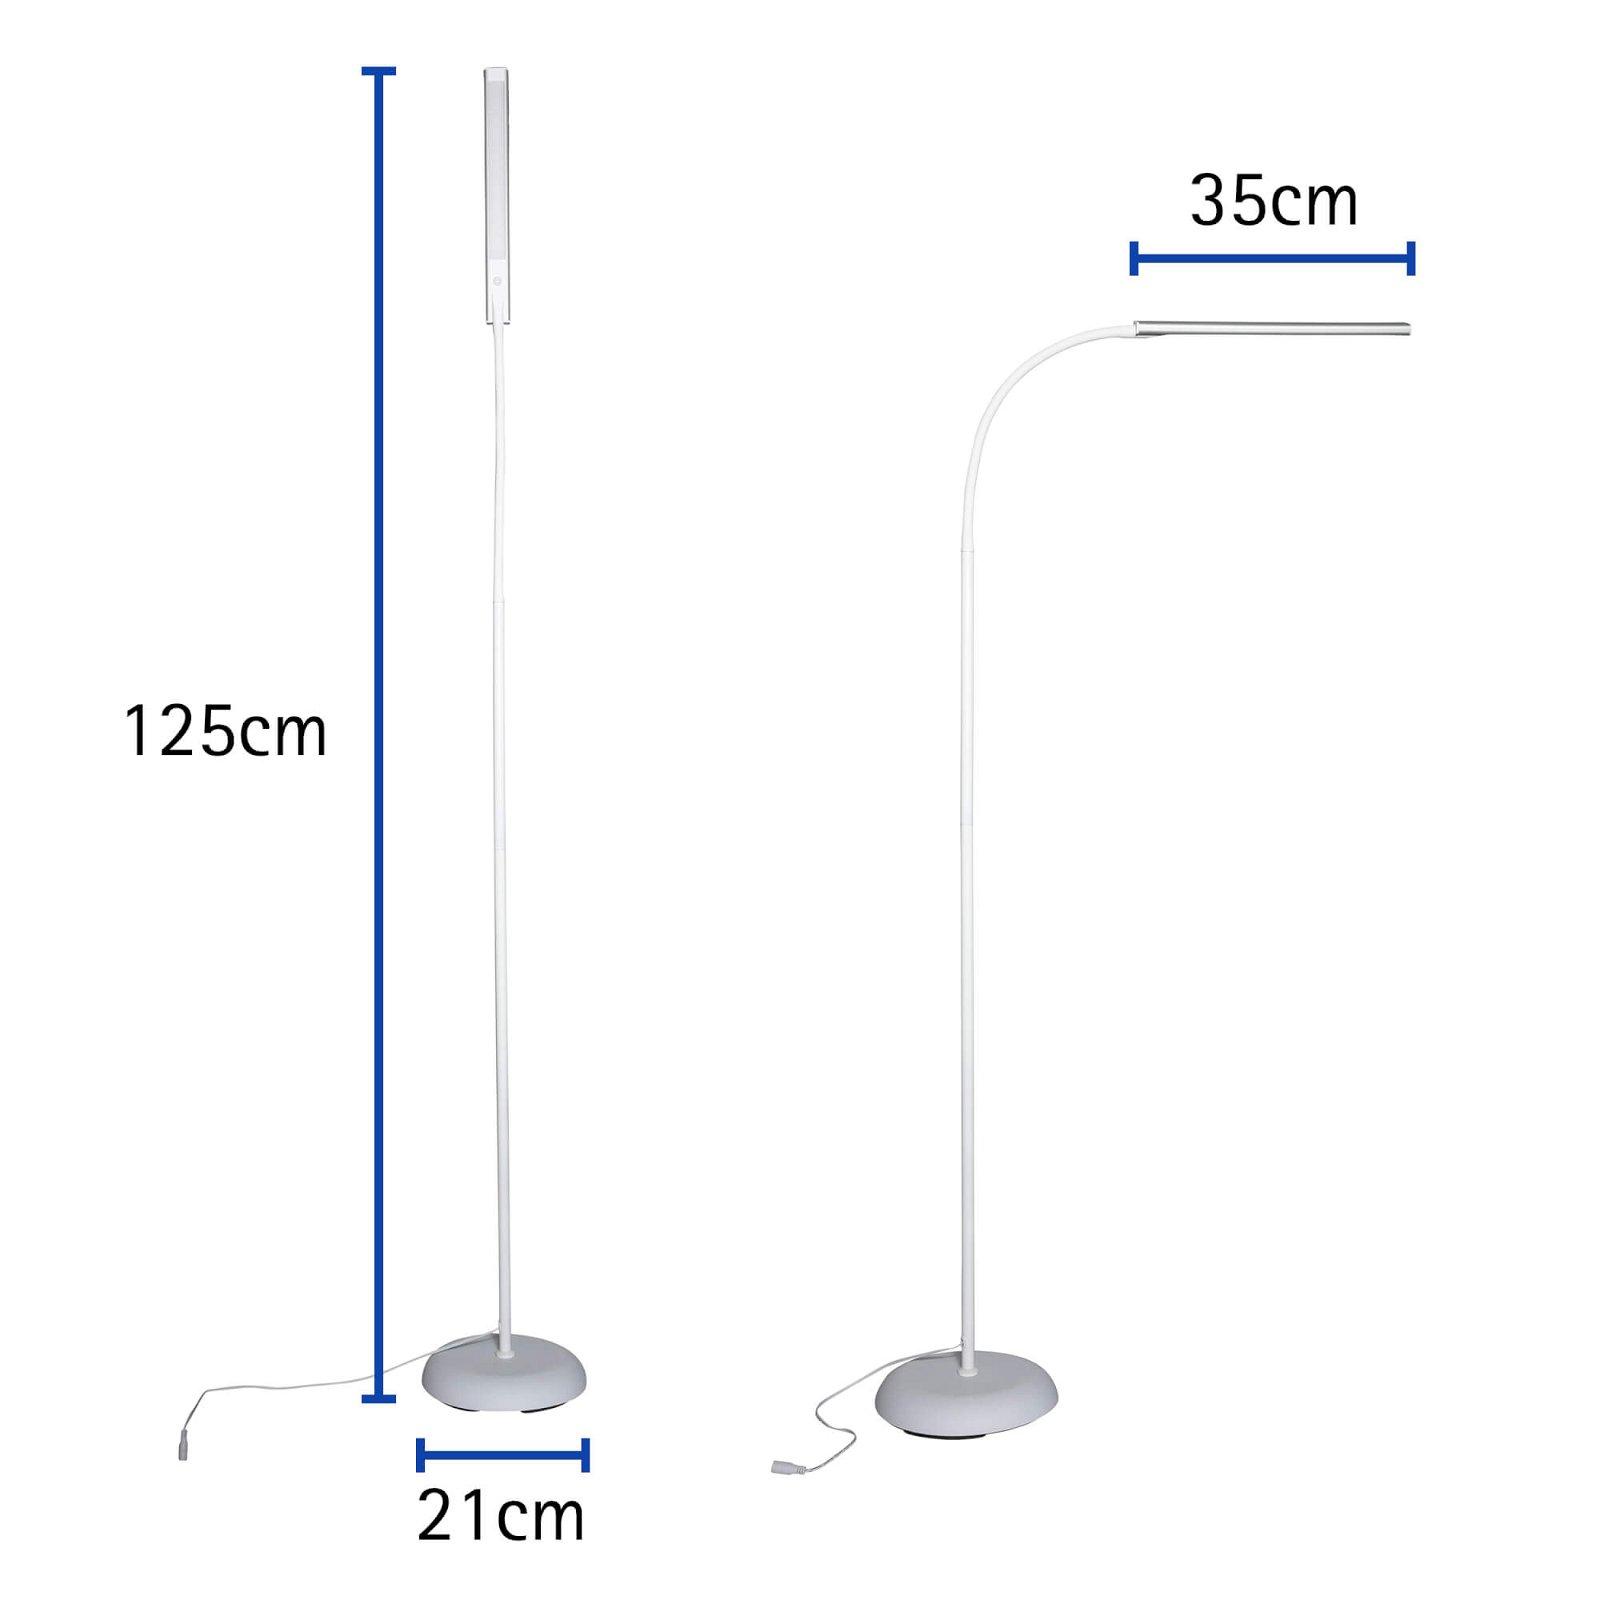 LED-Standleuchte MAULpirro, dimmbar